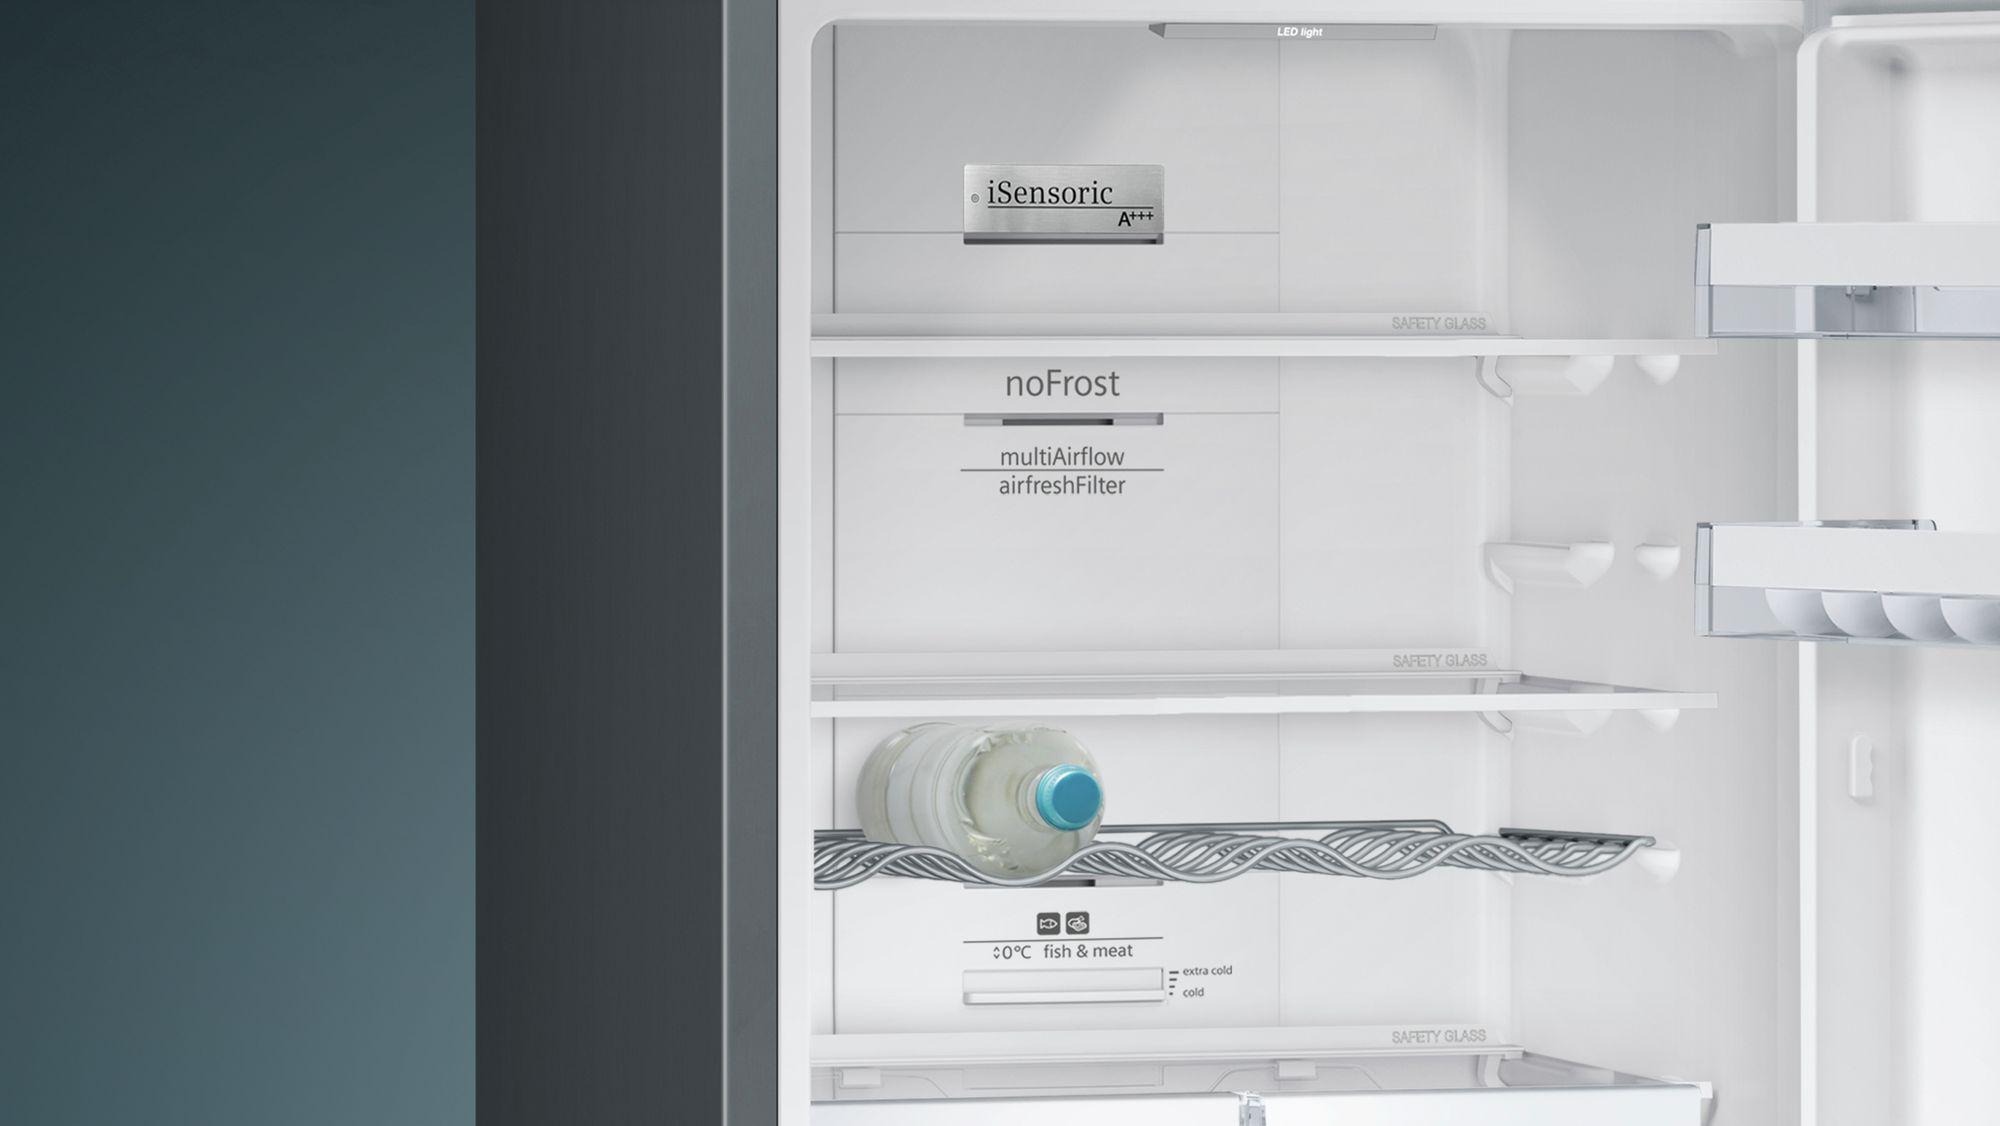 Siemens Kühlschrank Rollen : Siemens kühl gefrier kombination nofrost türen black inox